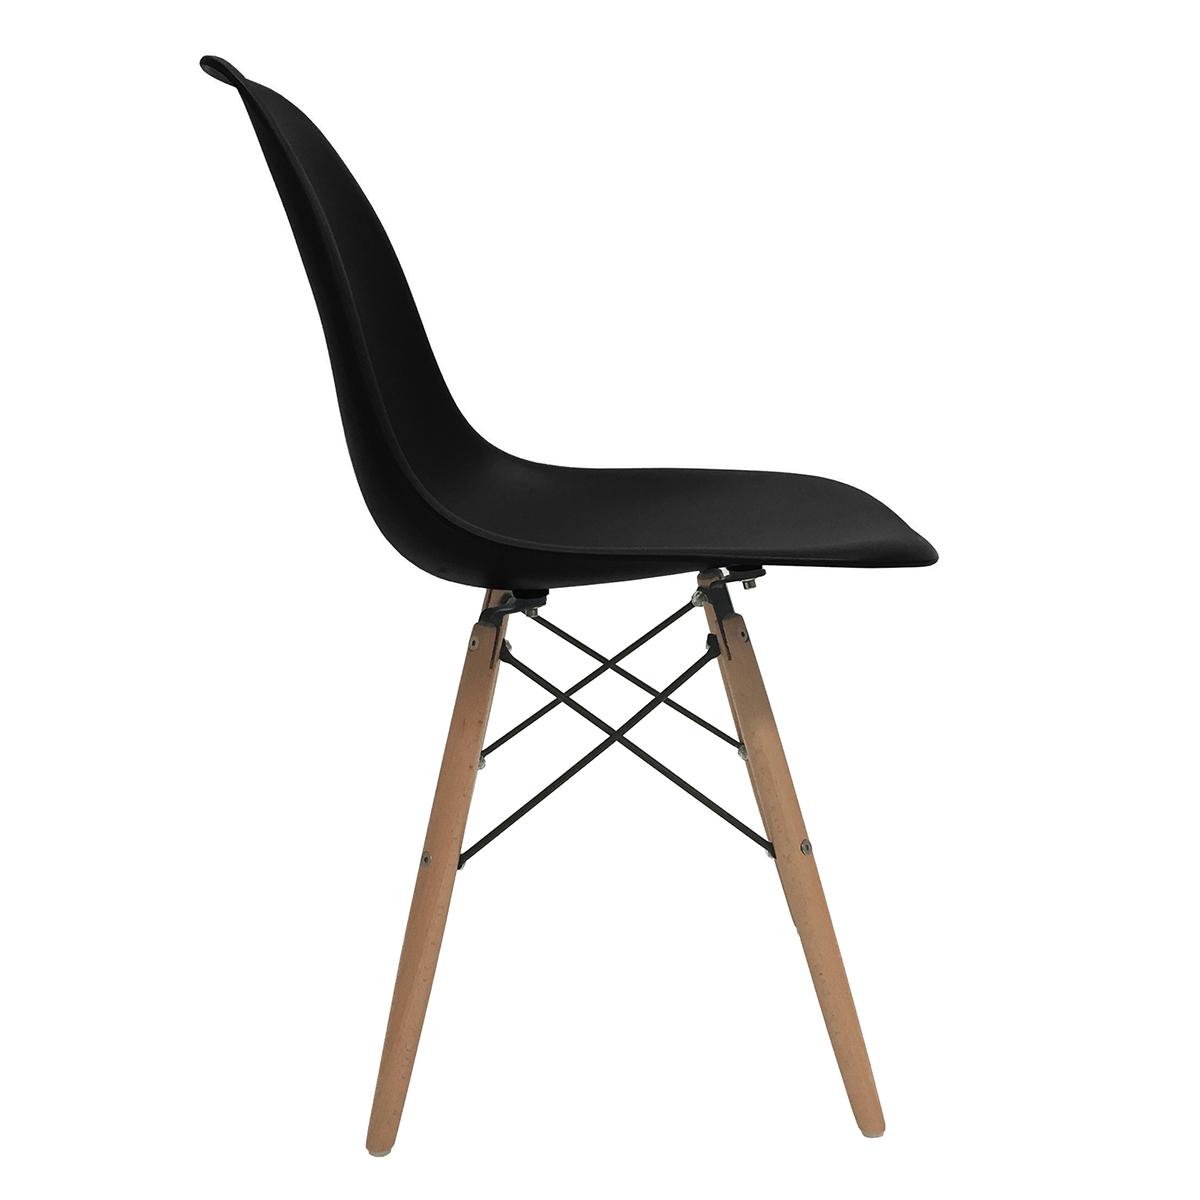 eames molded wood side chair high wooden set of 2 dsw dining eiffel dowel leg